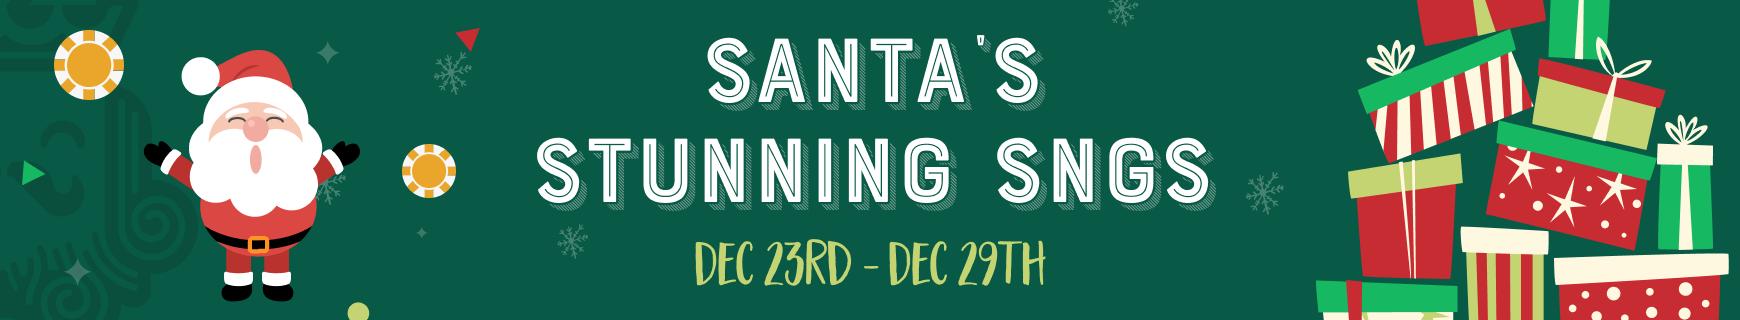 Santa's stunning sngs   dashboard %28870 x 160%29